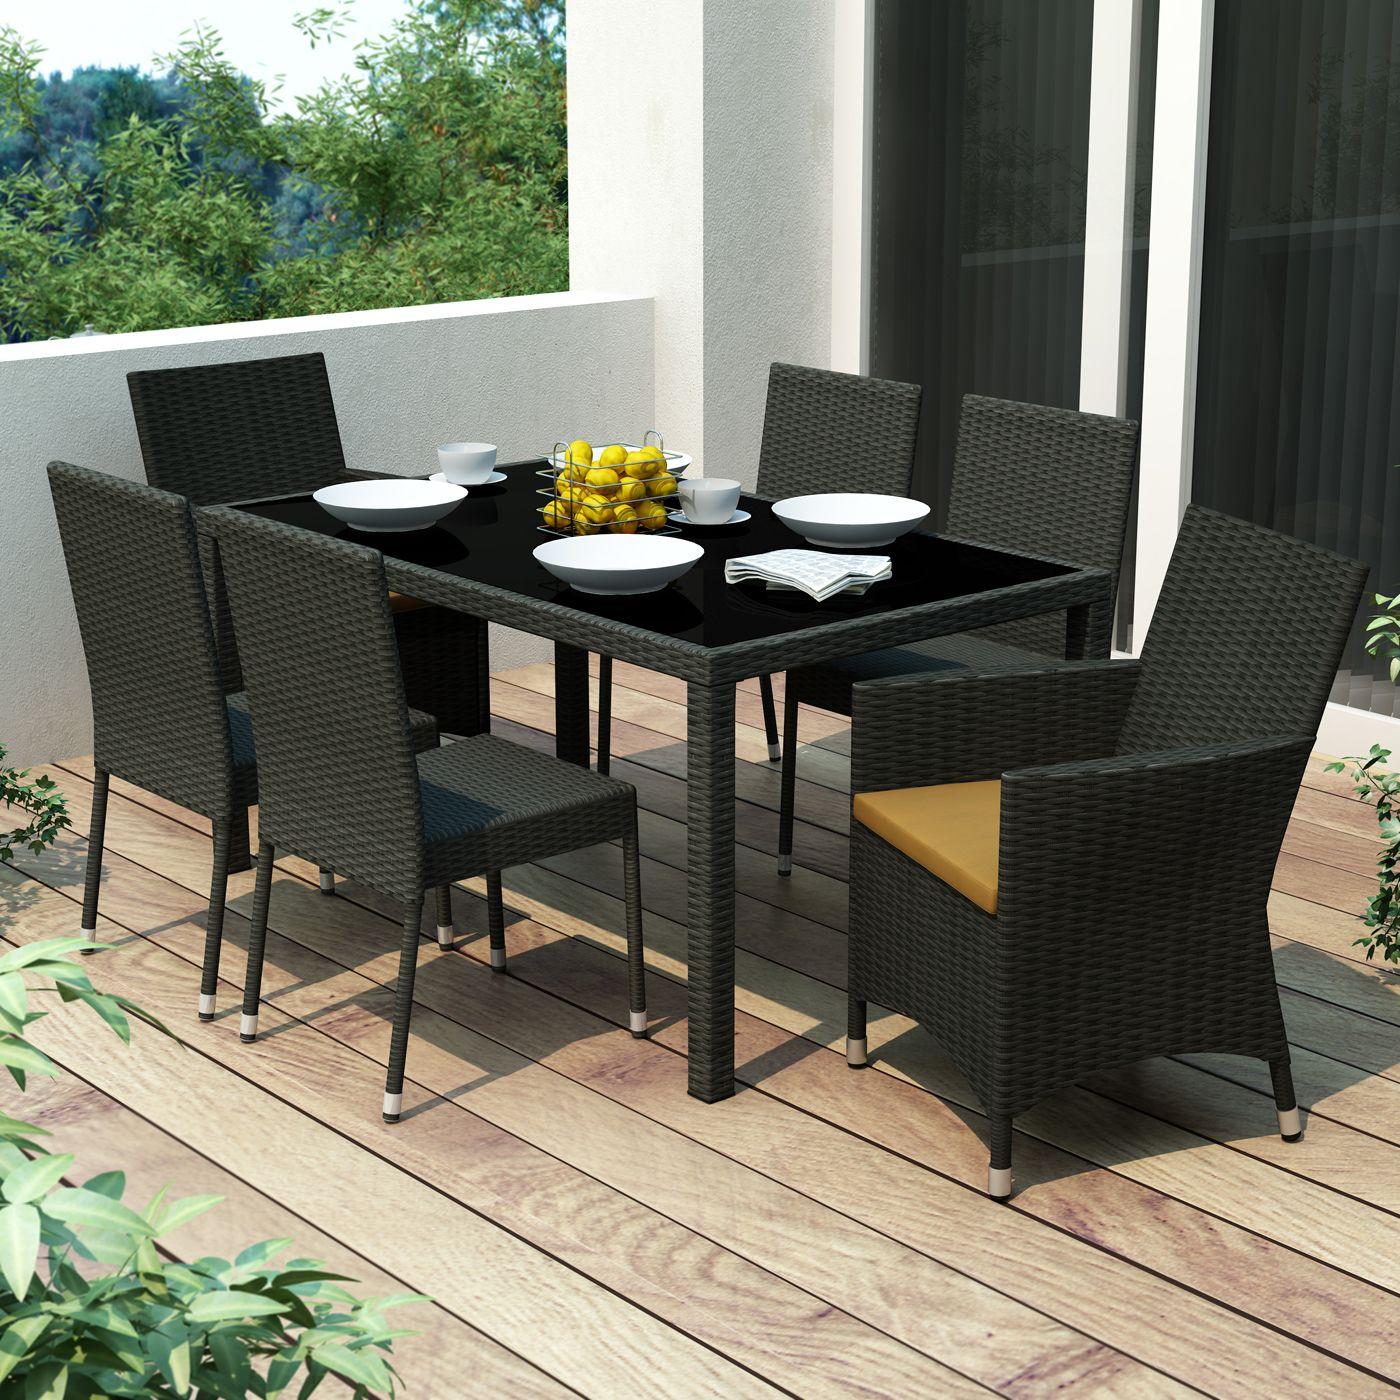 Outdoor Dining Set 7 Pieces Charcoal Elegant Diy Garden